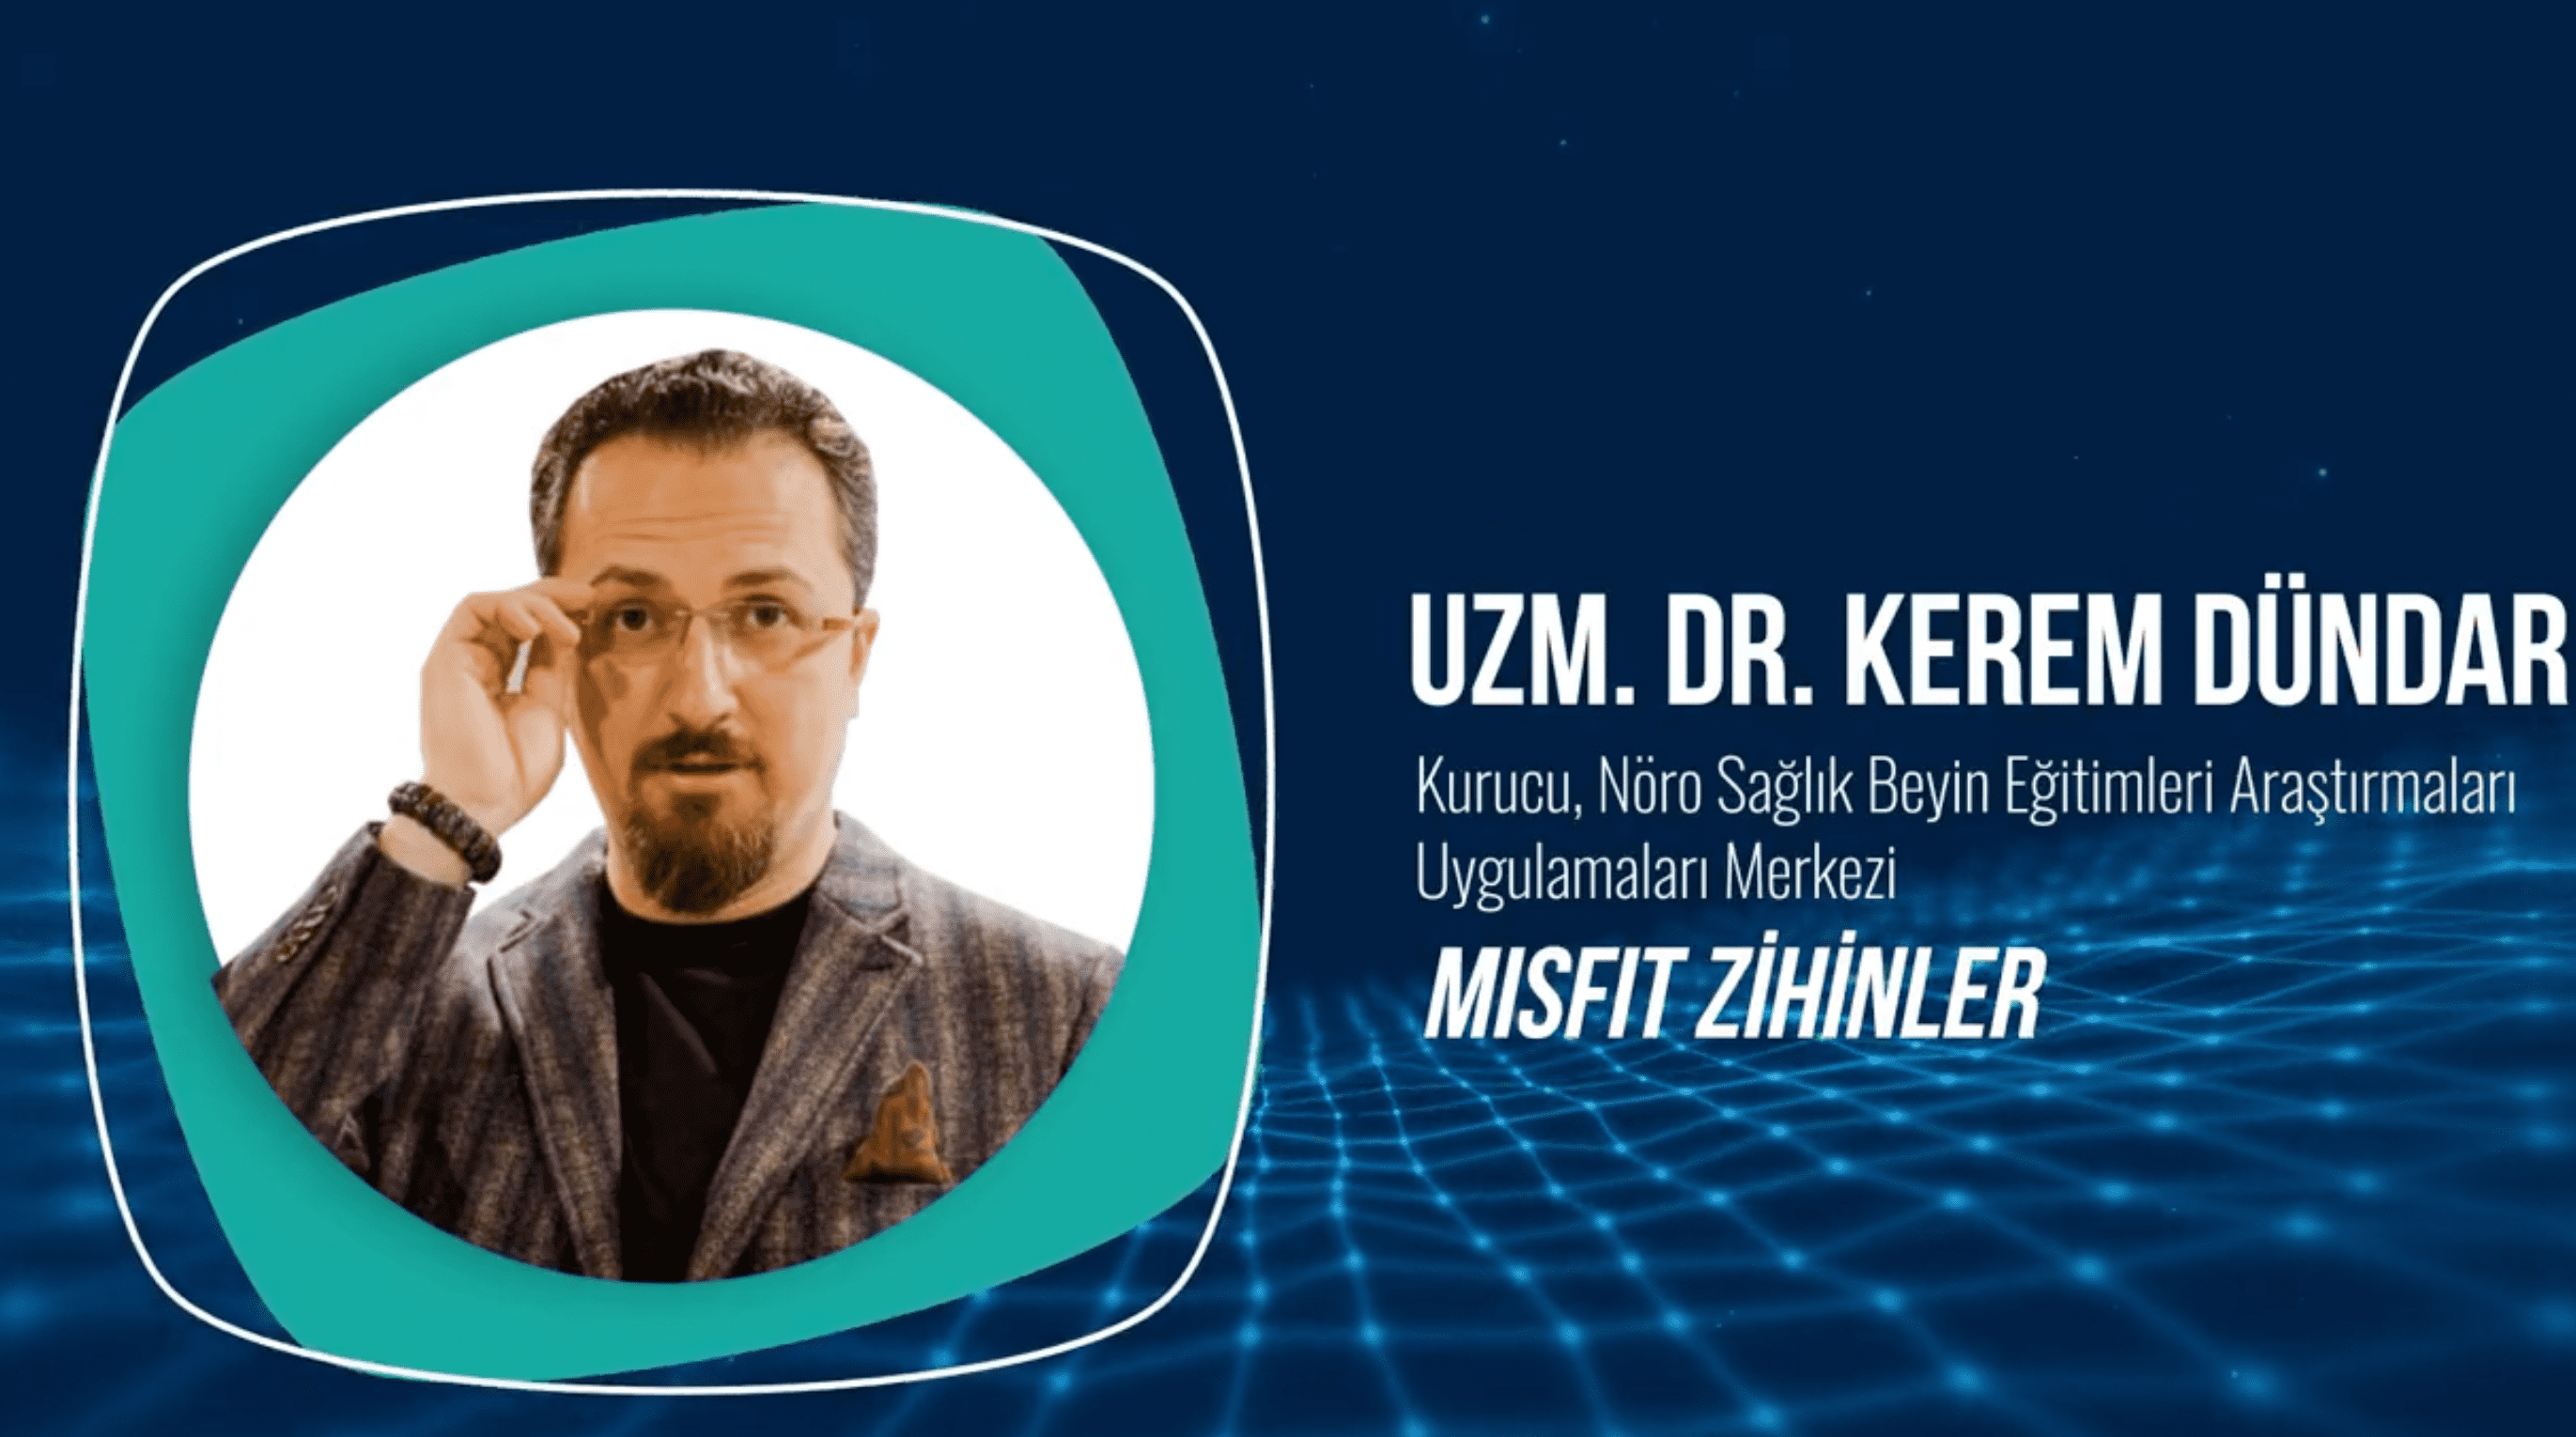 Uzm. Dr. Kerem Dündar, Marketing MeetUp sahnesinde